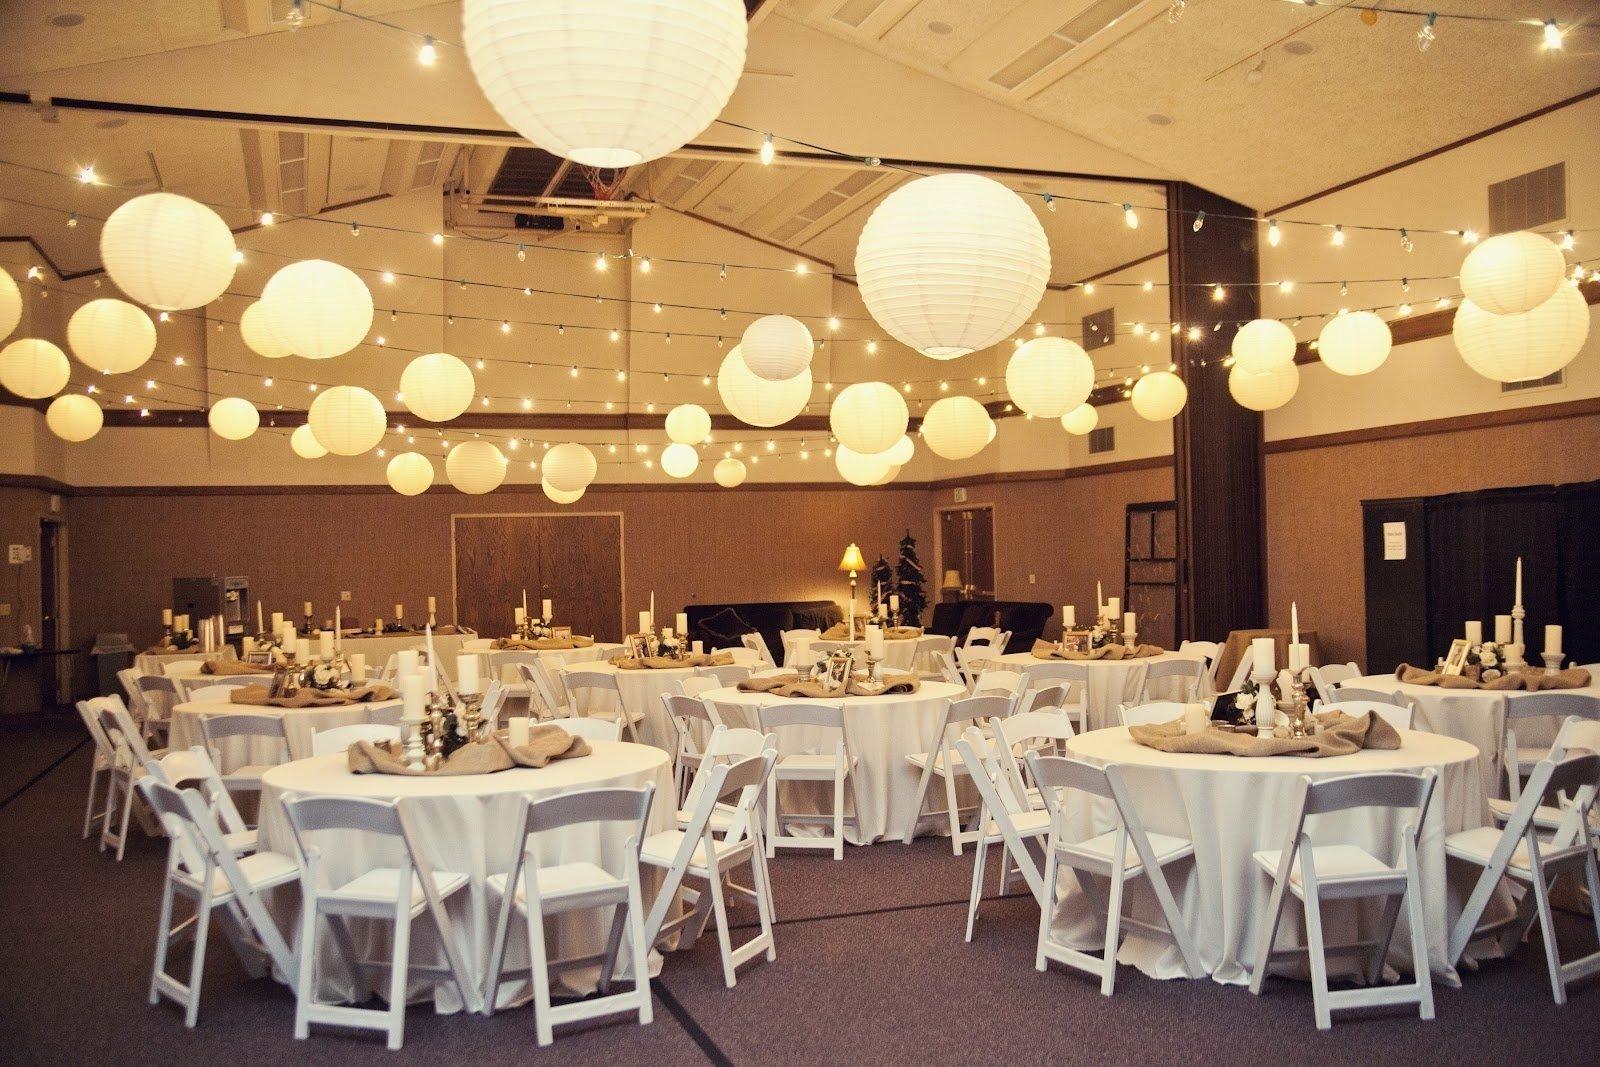 10 Fantastic Unique Wedding Ideas For Reception unique wedding reception decorations with image 19 of 21